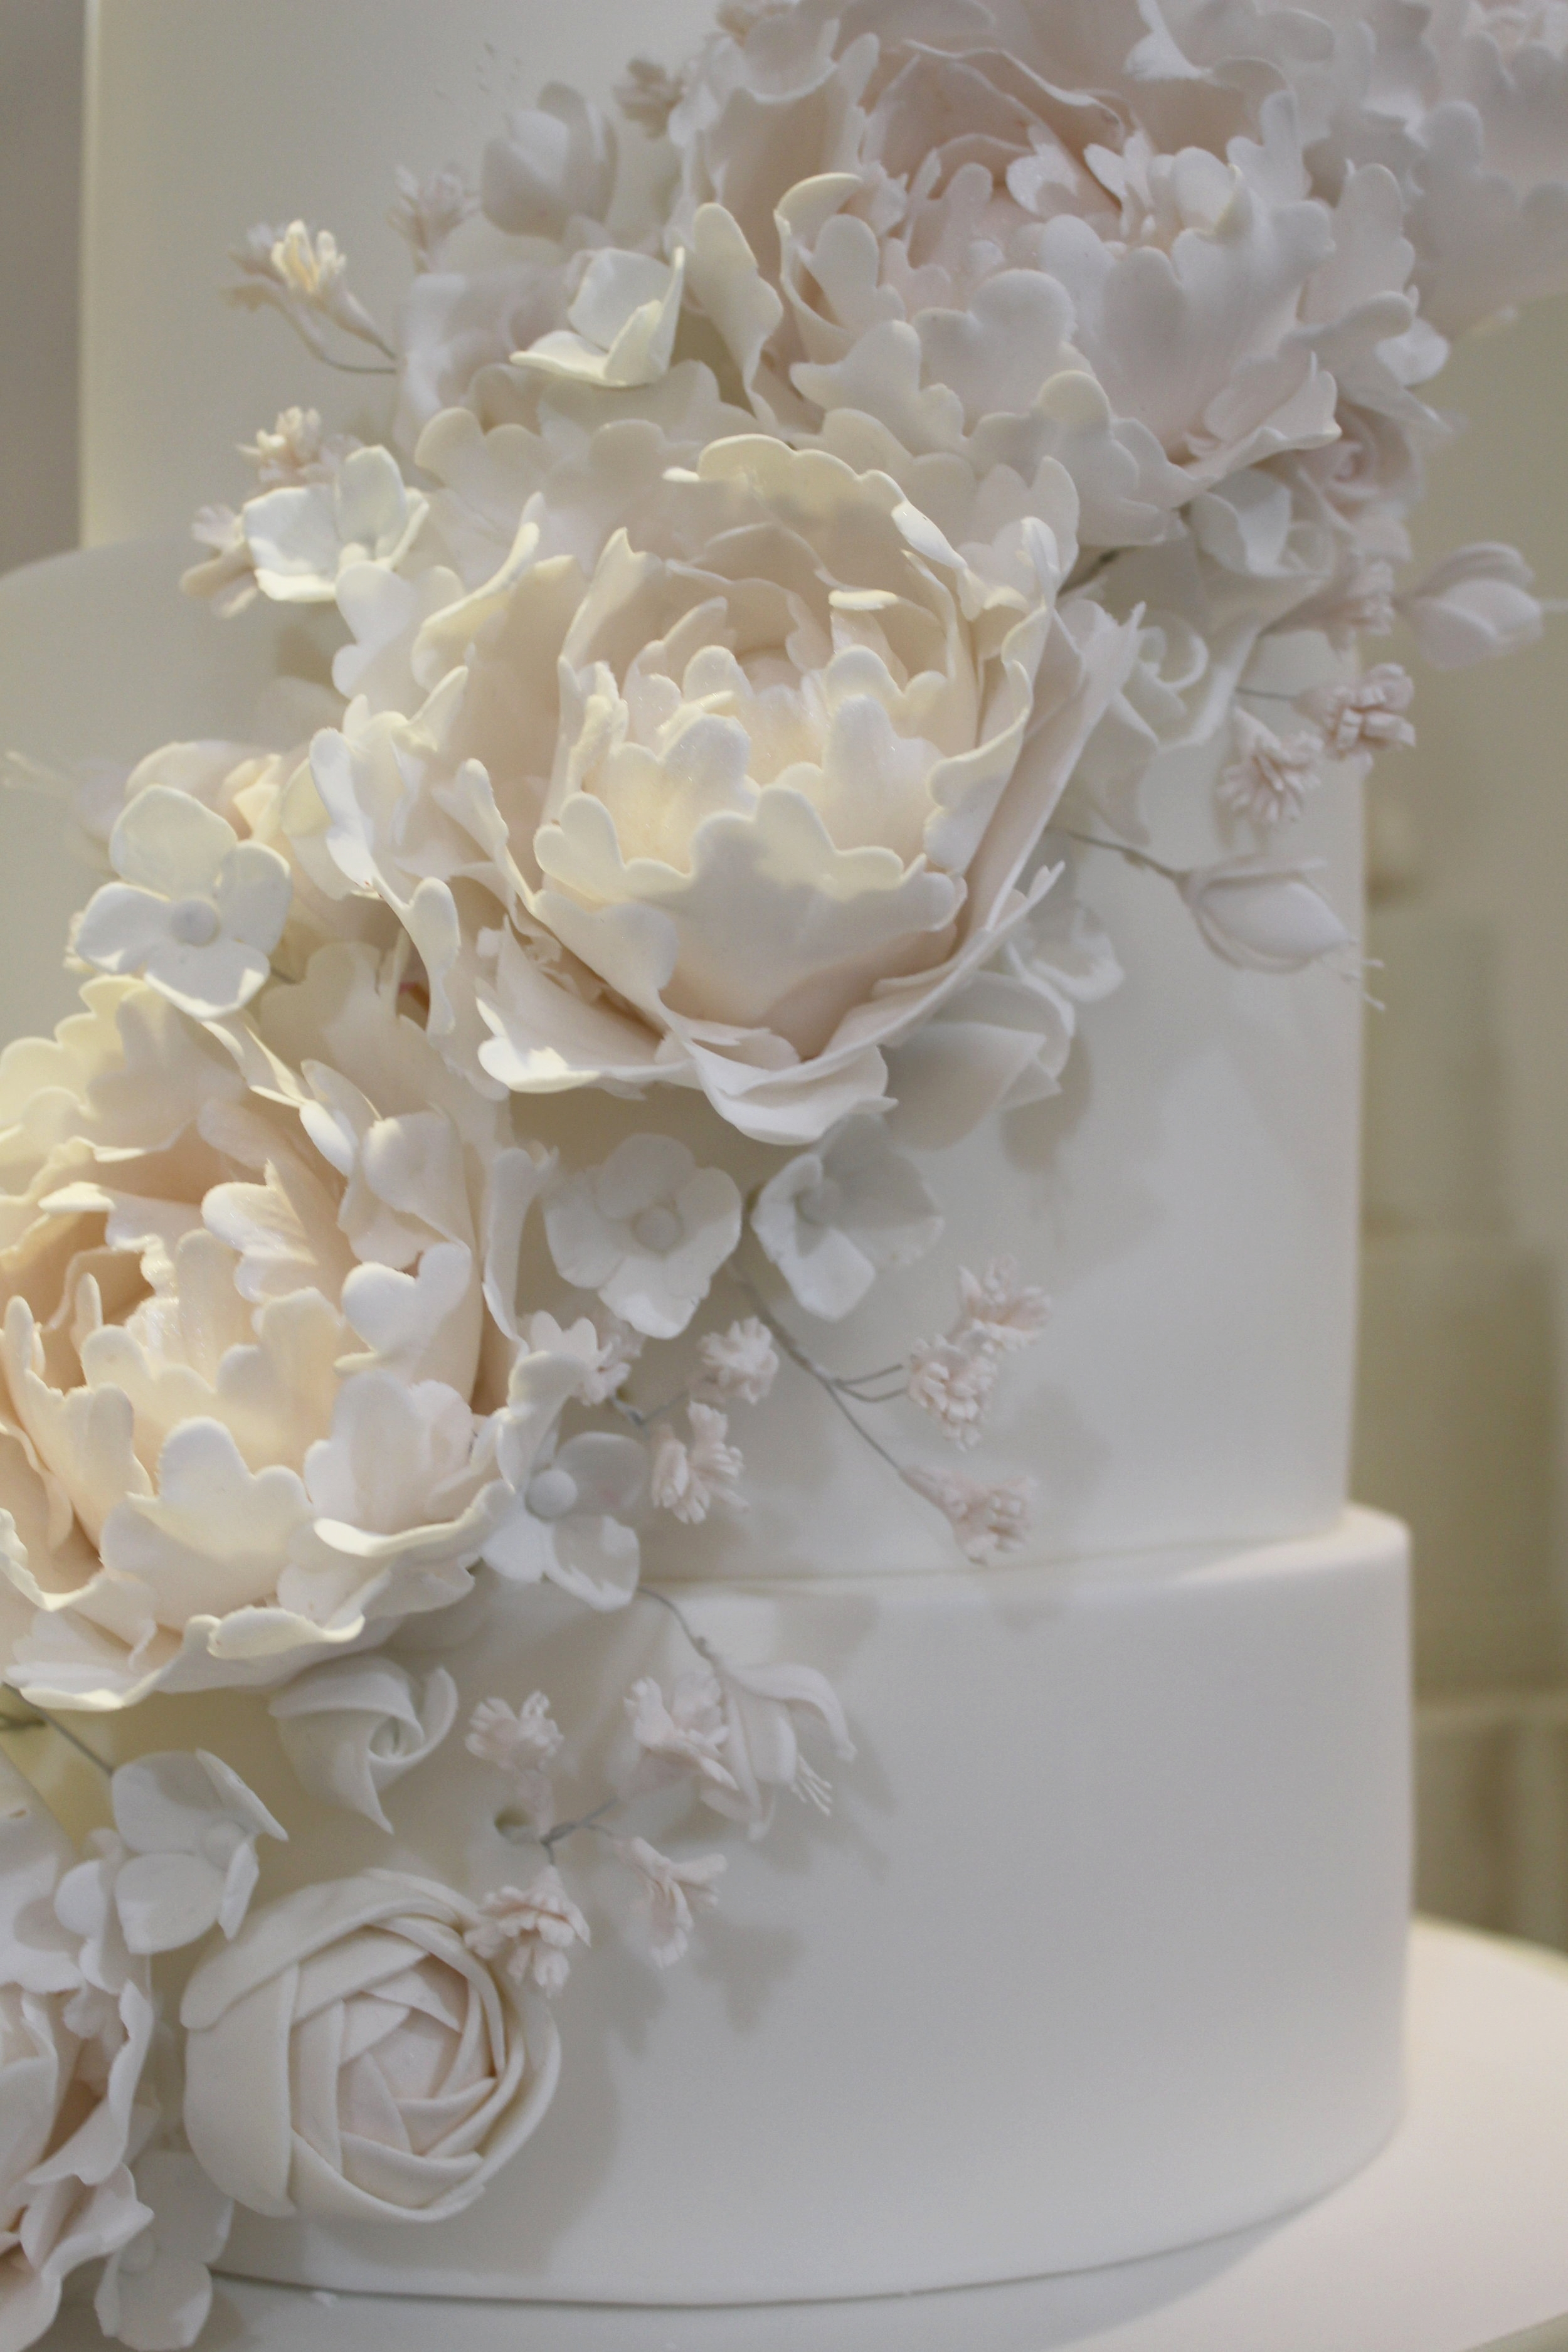 Sugar Flower Detail - peonies, roses, gyp, hydrangeas and freesias